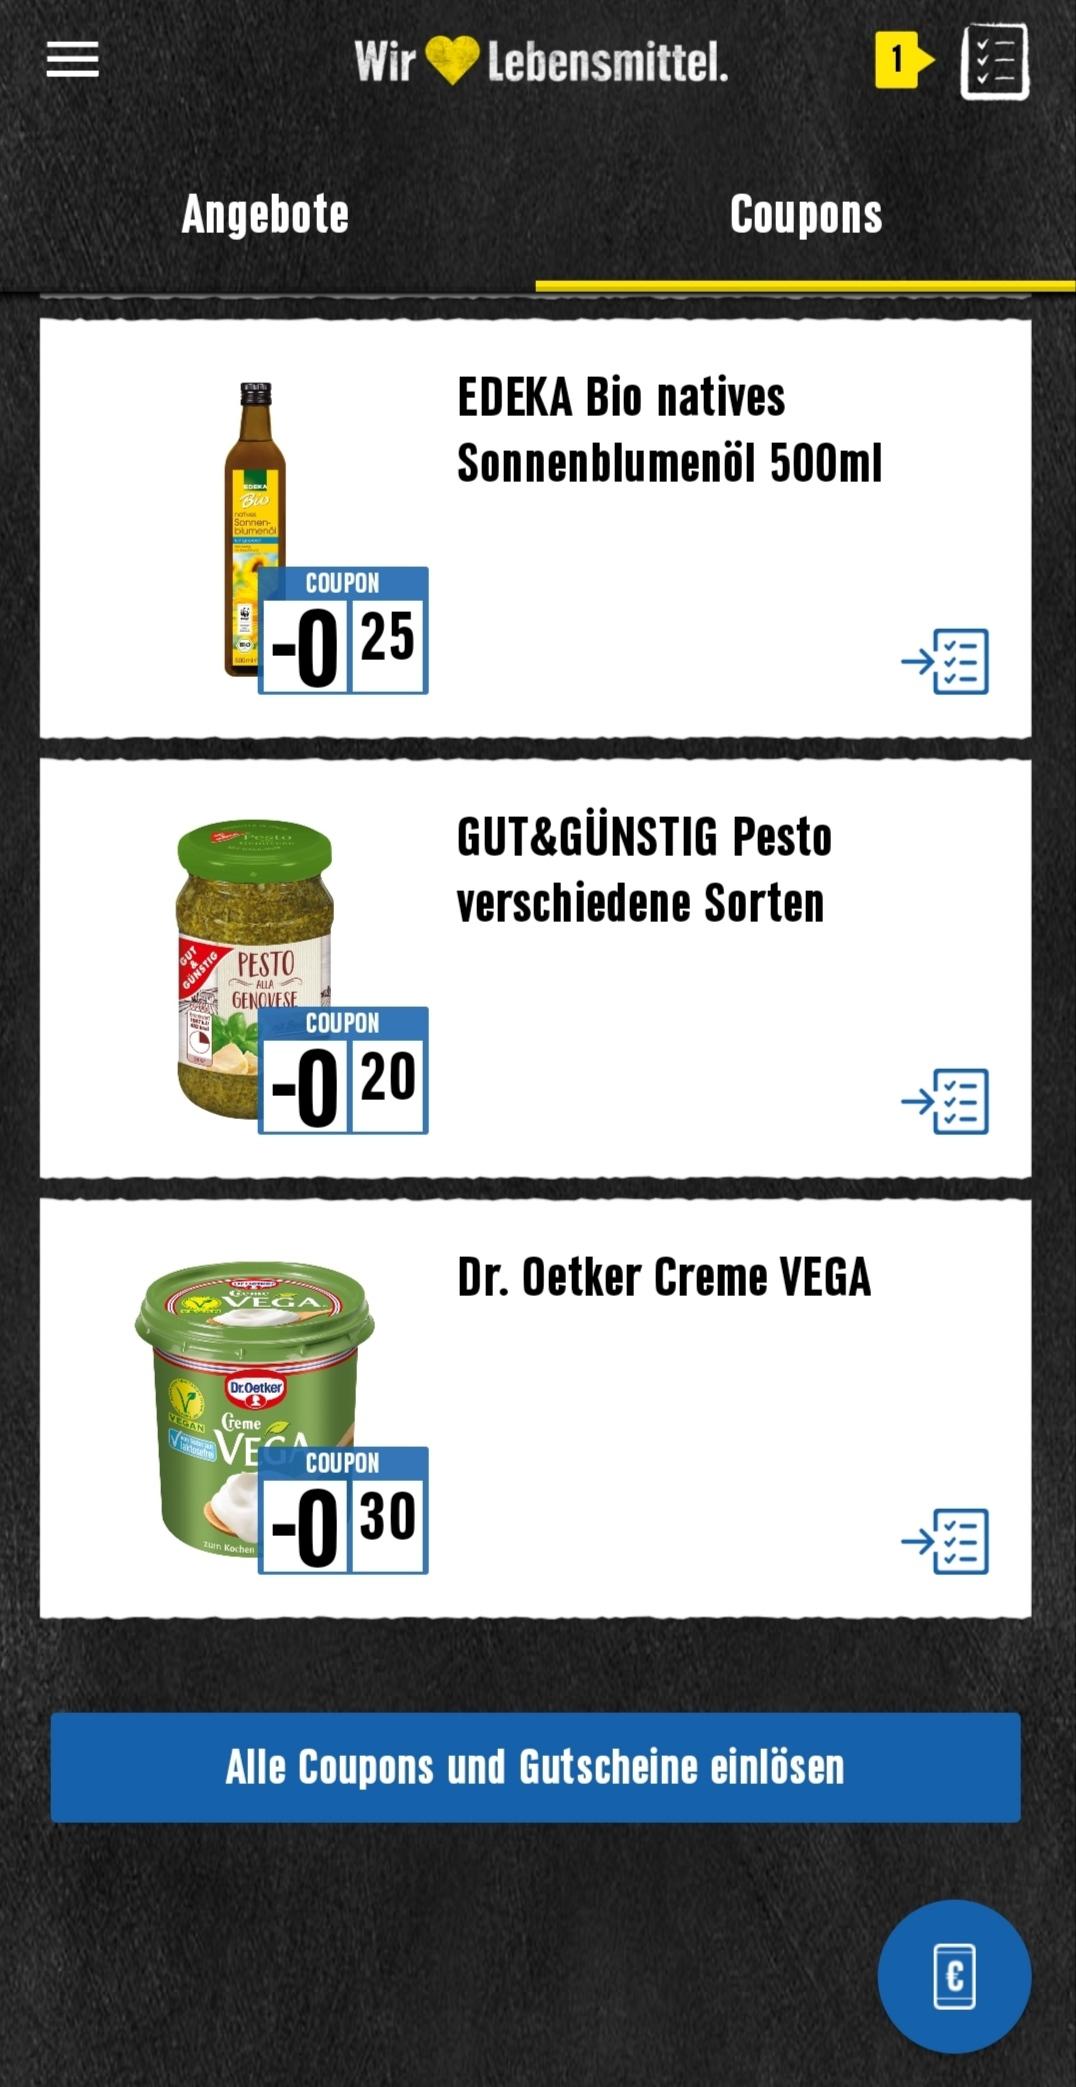 Edeka Dr. Oetker Creme Vega Edeka App Coupon und Coupies (5 x einlösbar)